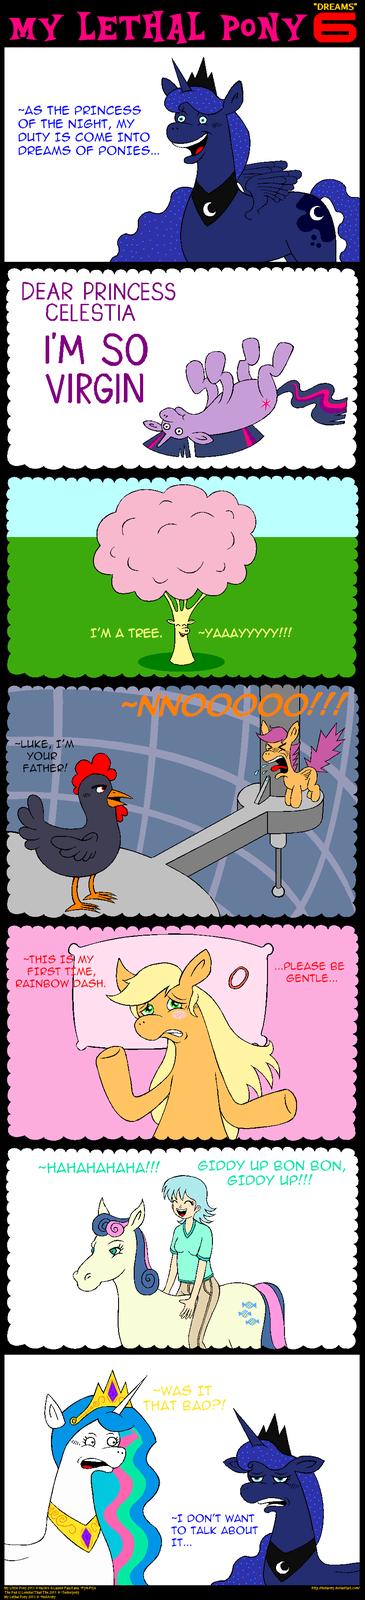 My Lethal Pony 6: Dreams